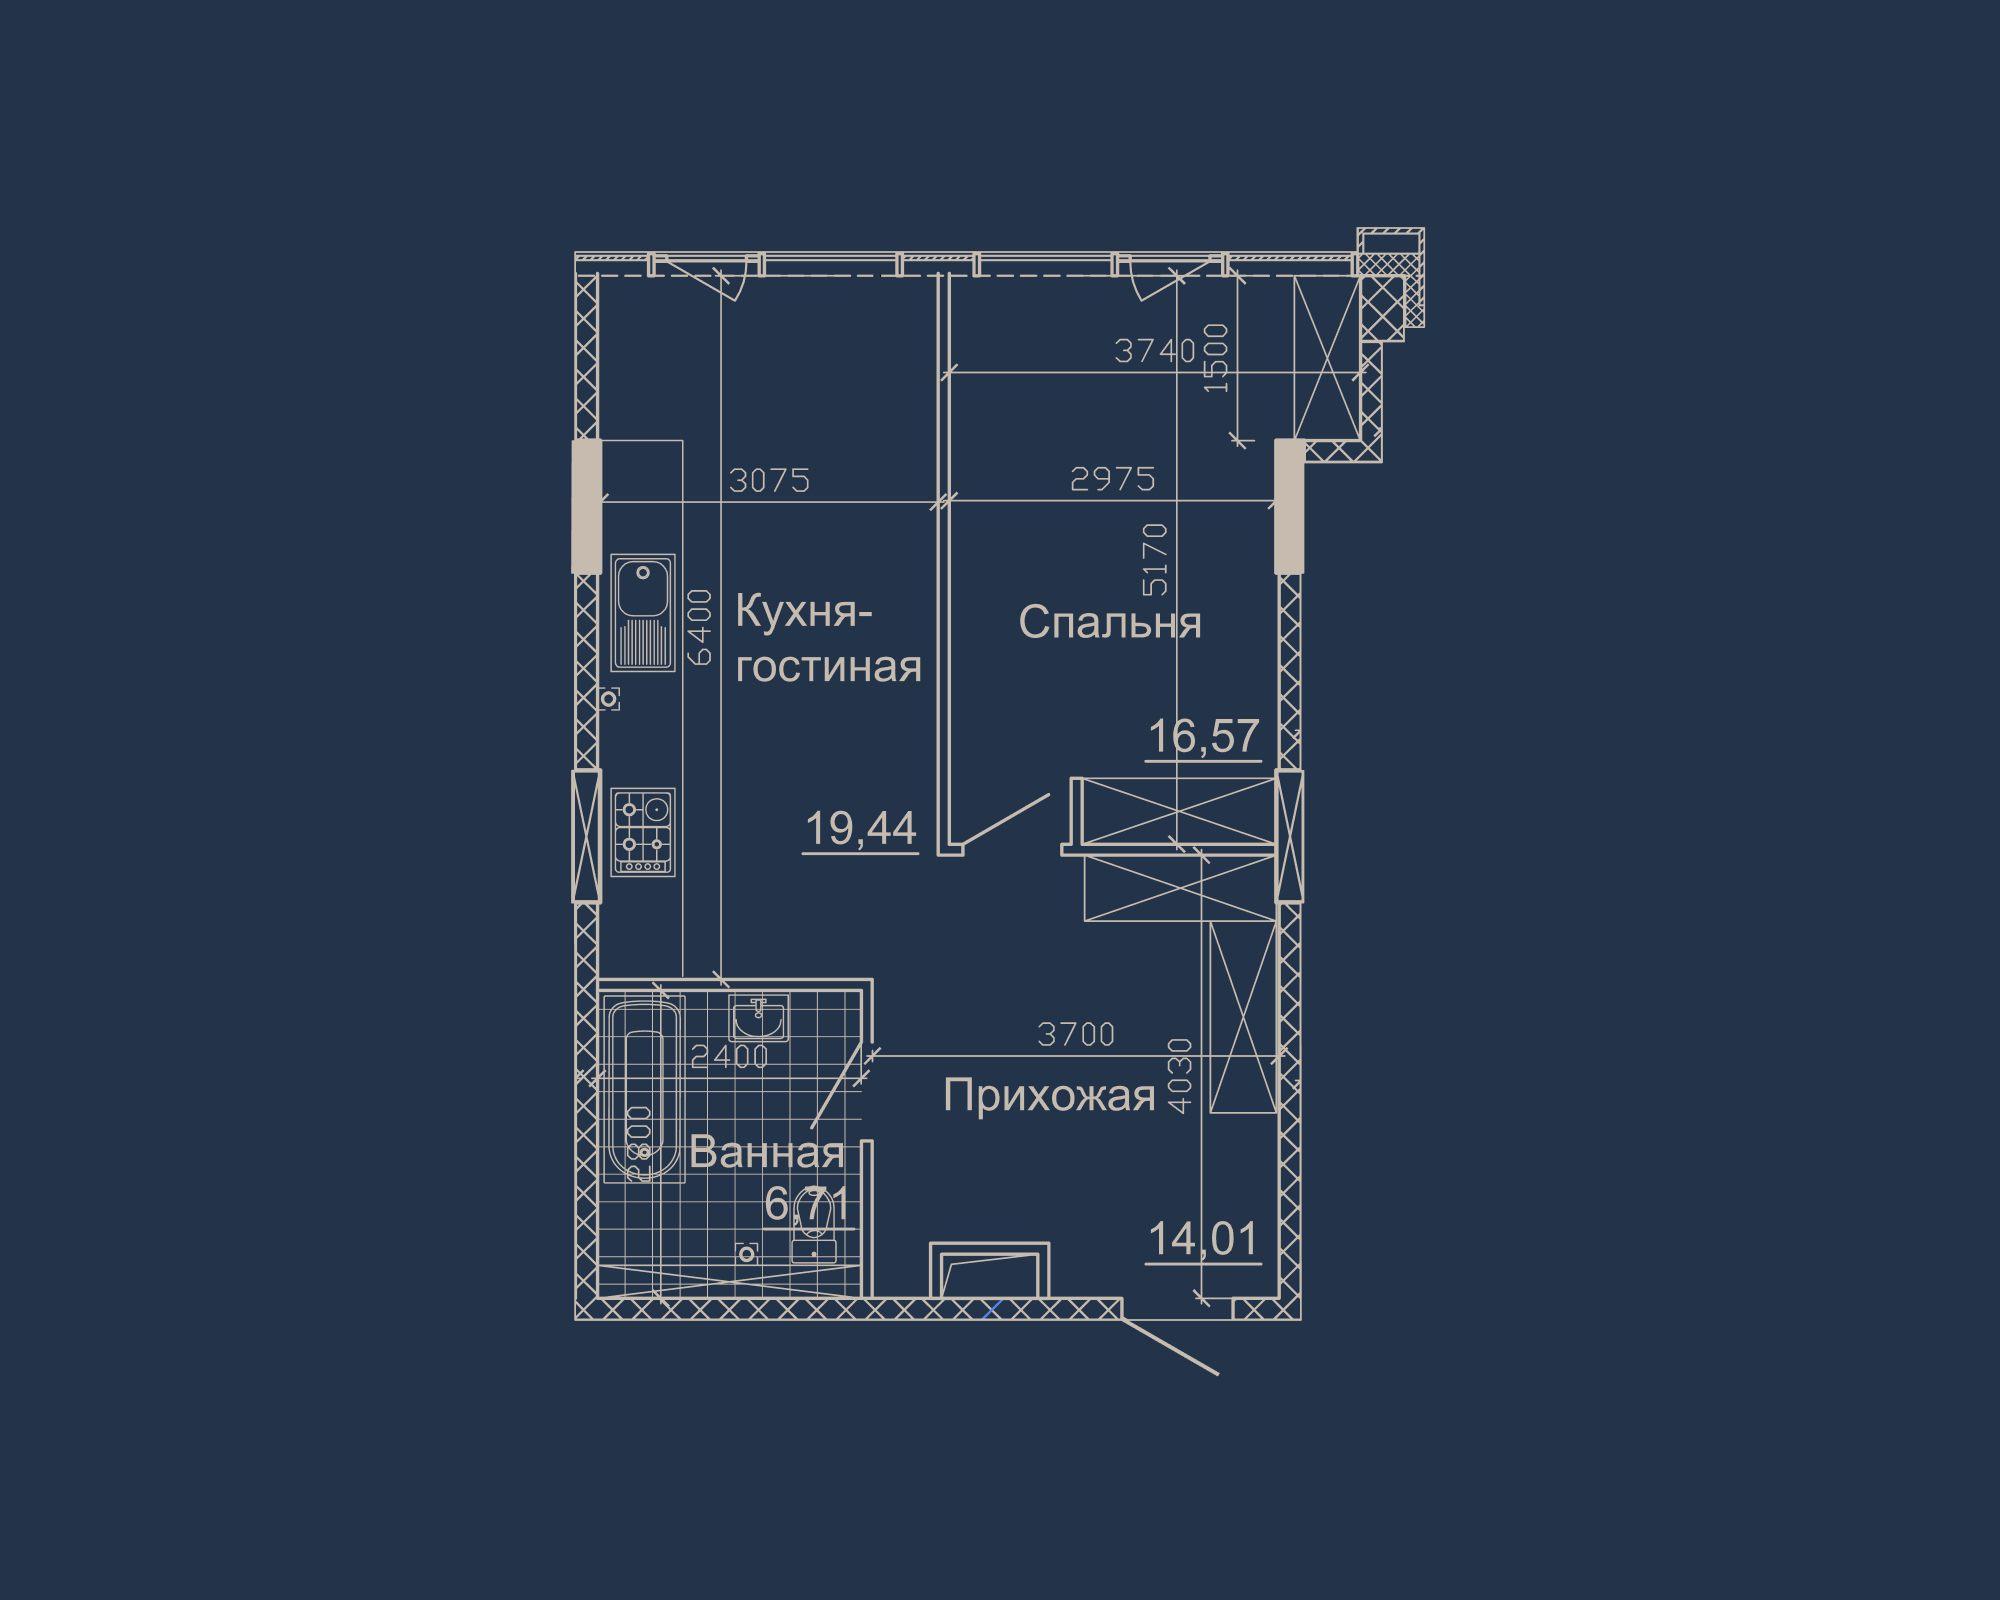 1-кімнатна квартира типу 04А-1 у ЖК Nebo